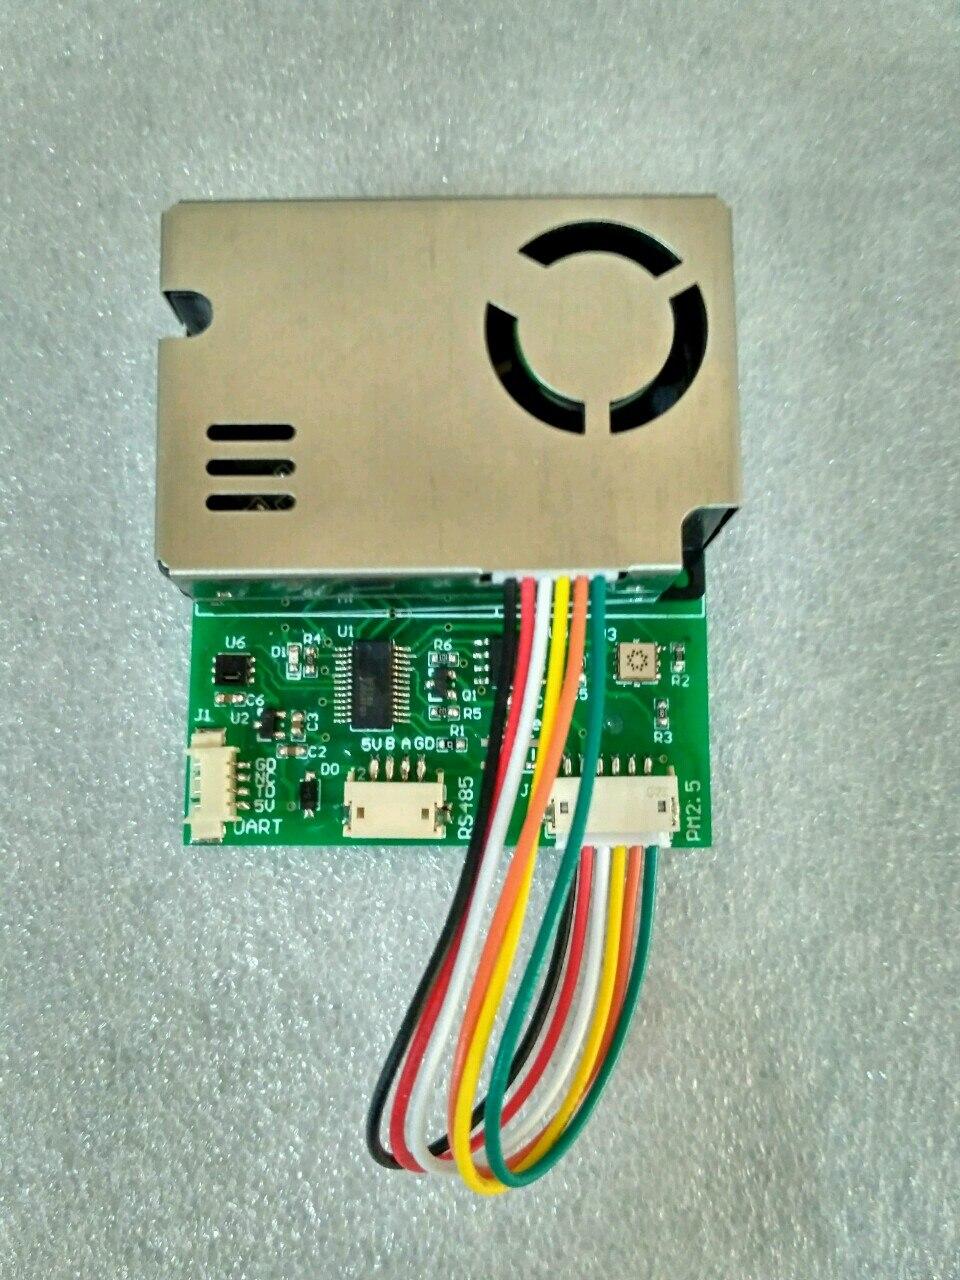 Tester 7 Integrated Sensor Module 485 Output PM2.5/10 Temperature and Humidity C02 Formaldehyde TVOCTester 7 Integrated Sensor Module 485 Output PM2.5/10 Temperature and Humidity C02 Formaldehyde TVOC